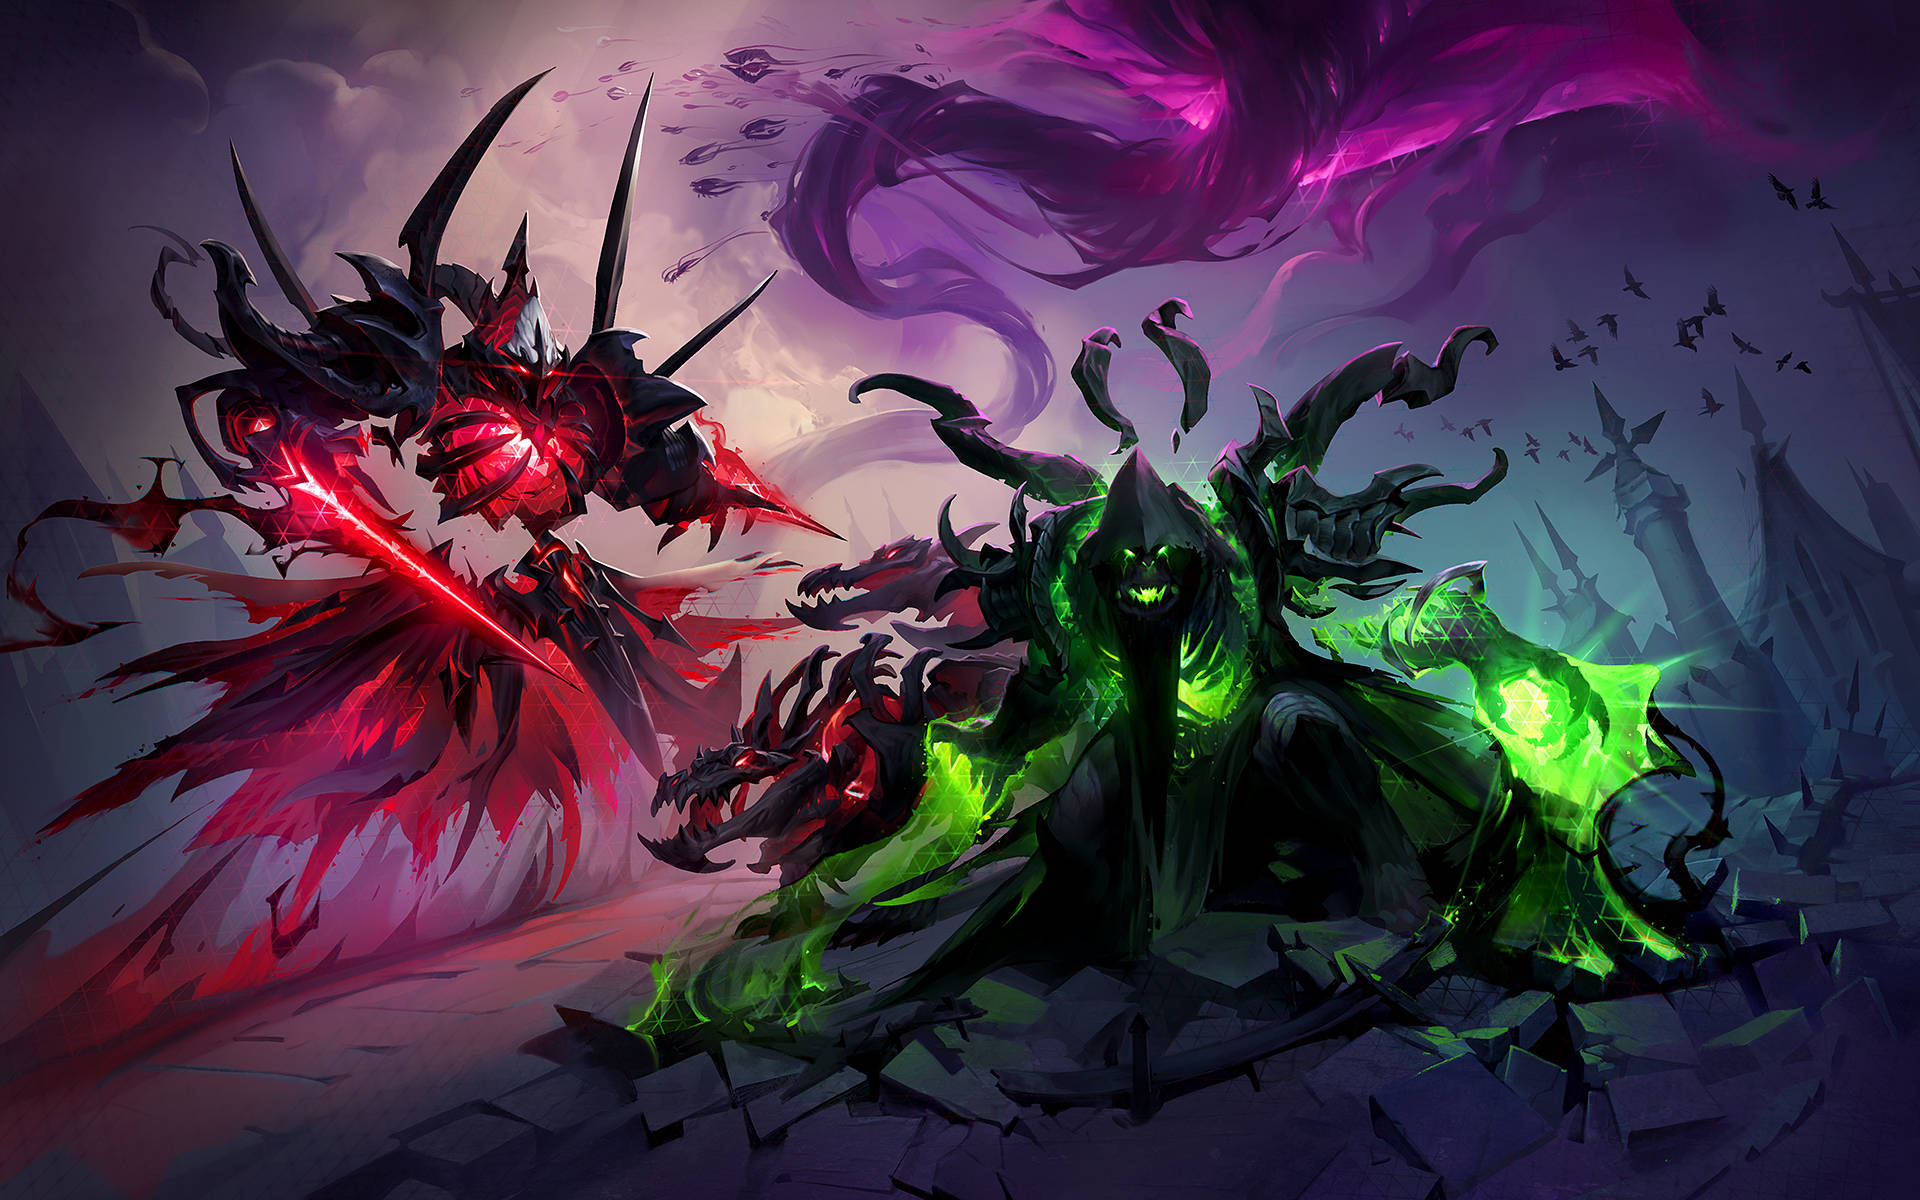 Heroes of the Storm bekommt eigene Hintergrundstory, bringt coole Skins